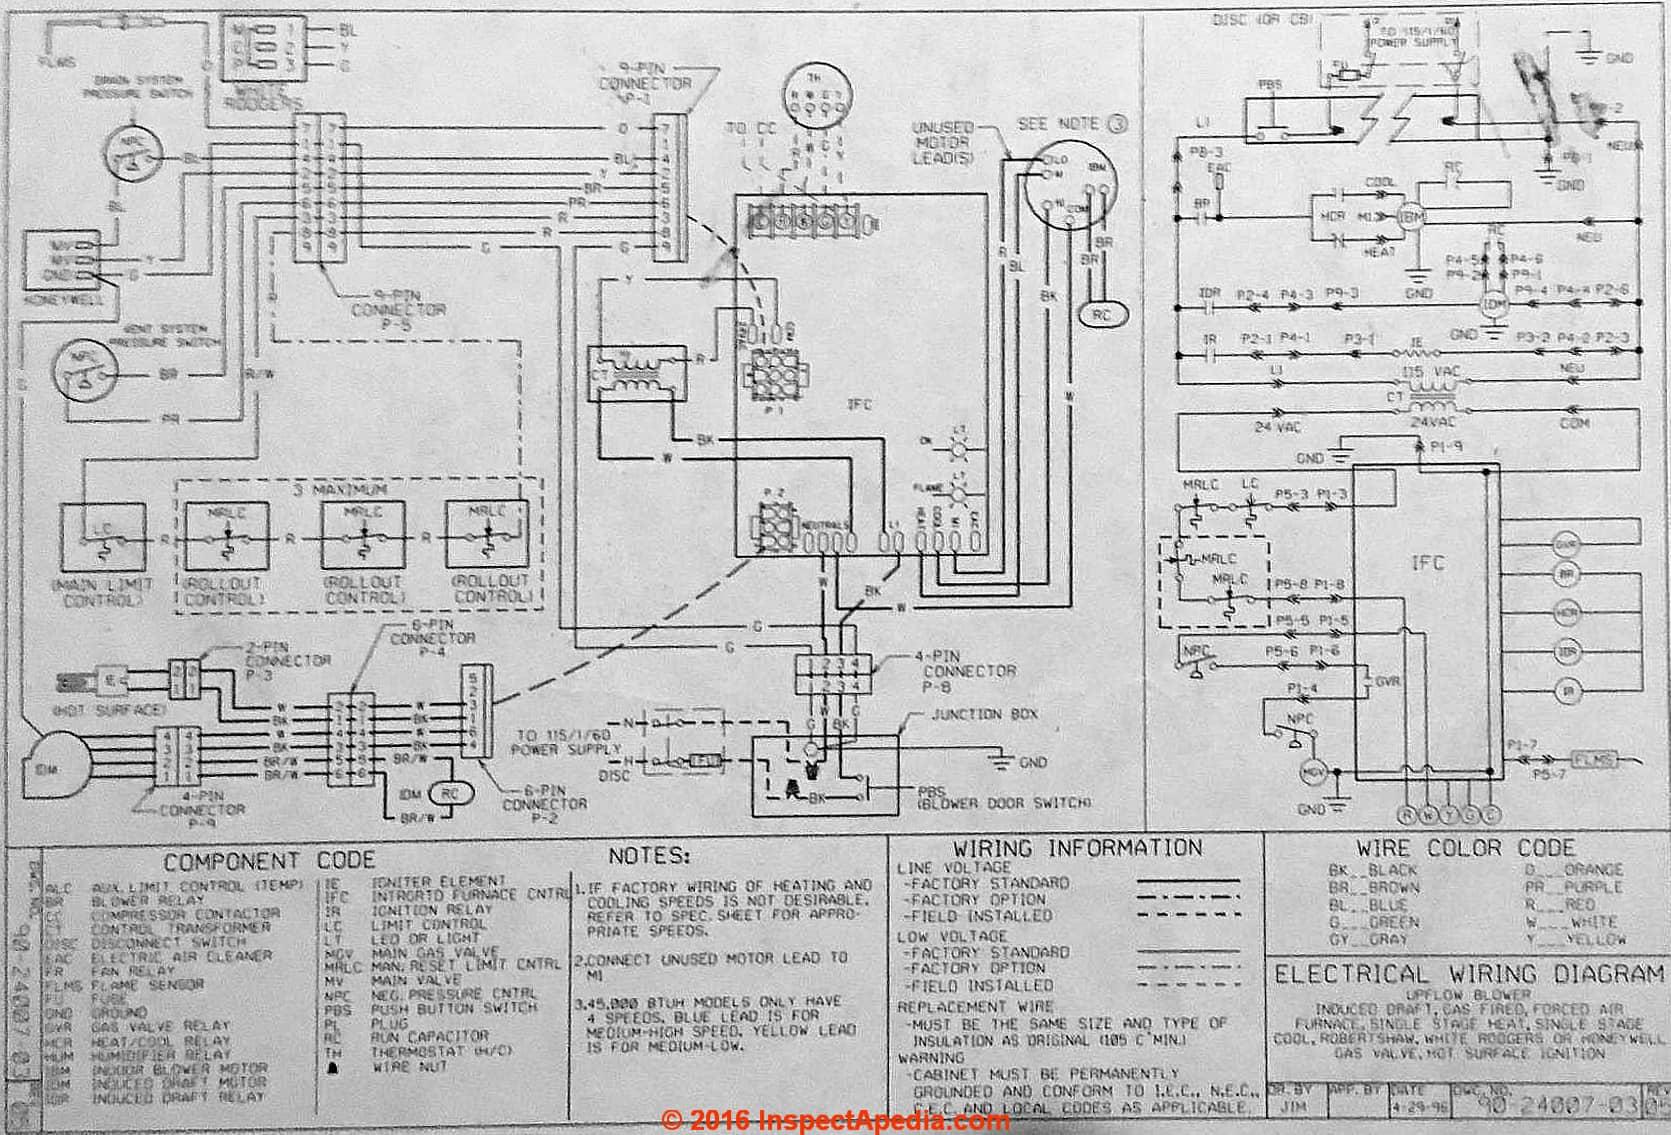 Rheem Furnace Wiring Diagram Heat Pump Electrical Wire Ruud Condenser Fan Motor Diagramrheem